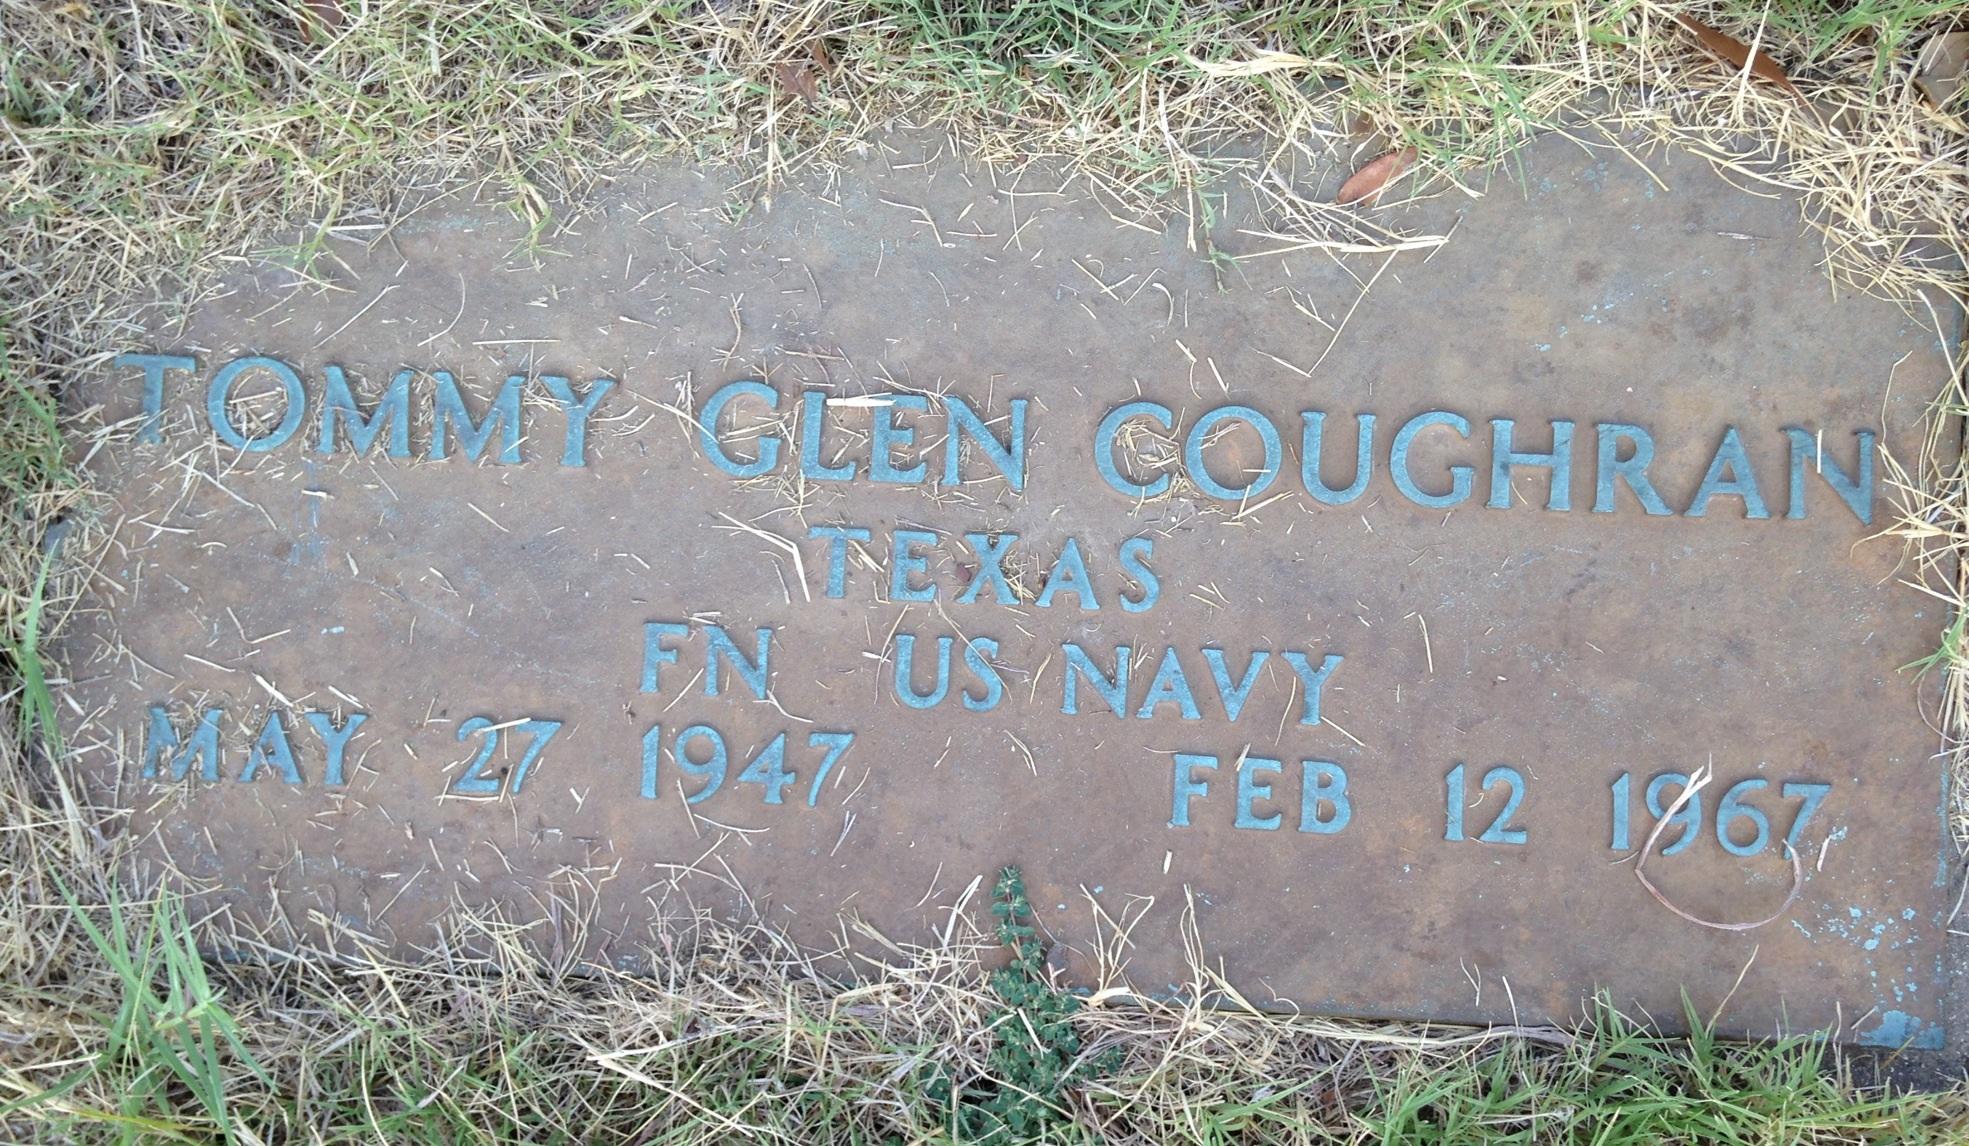 Tommy Glenn Coughran